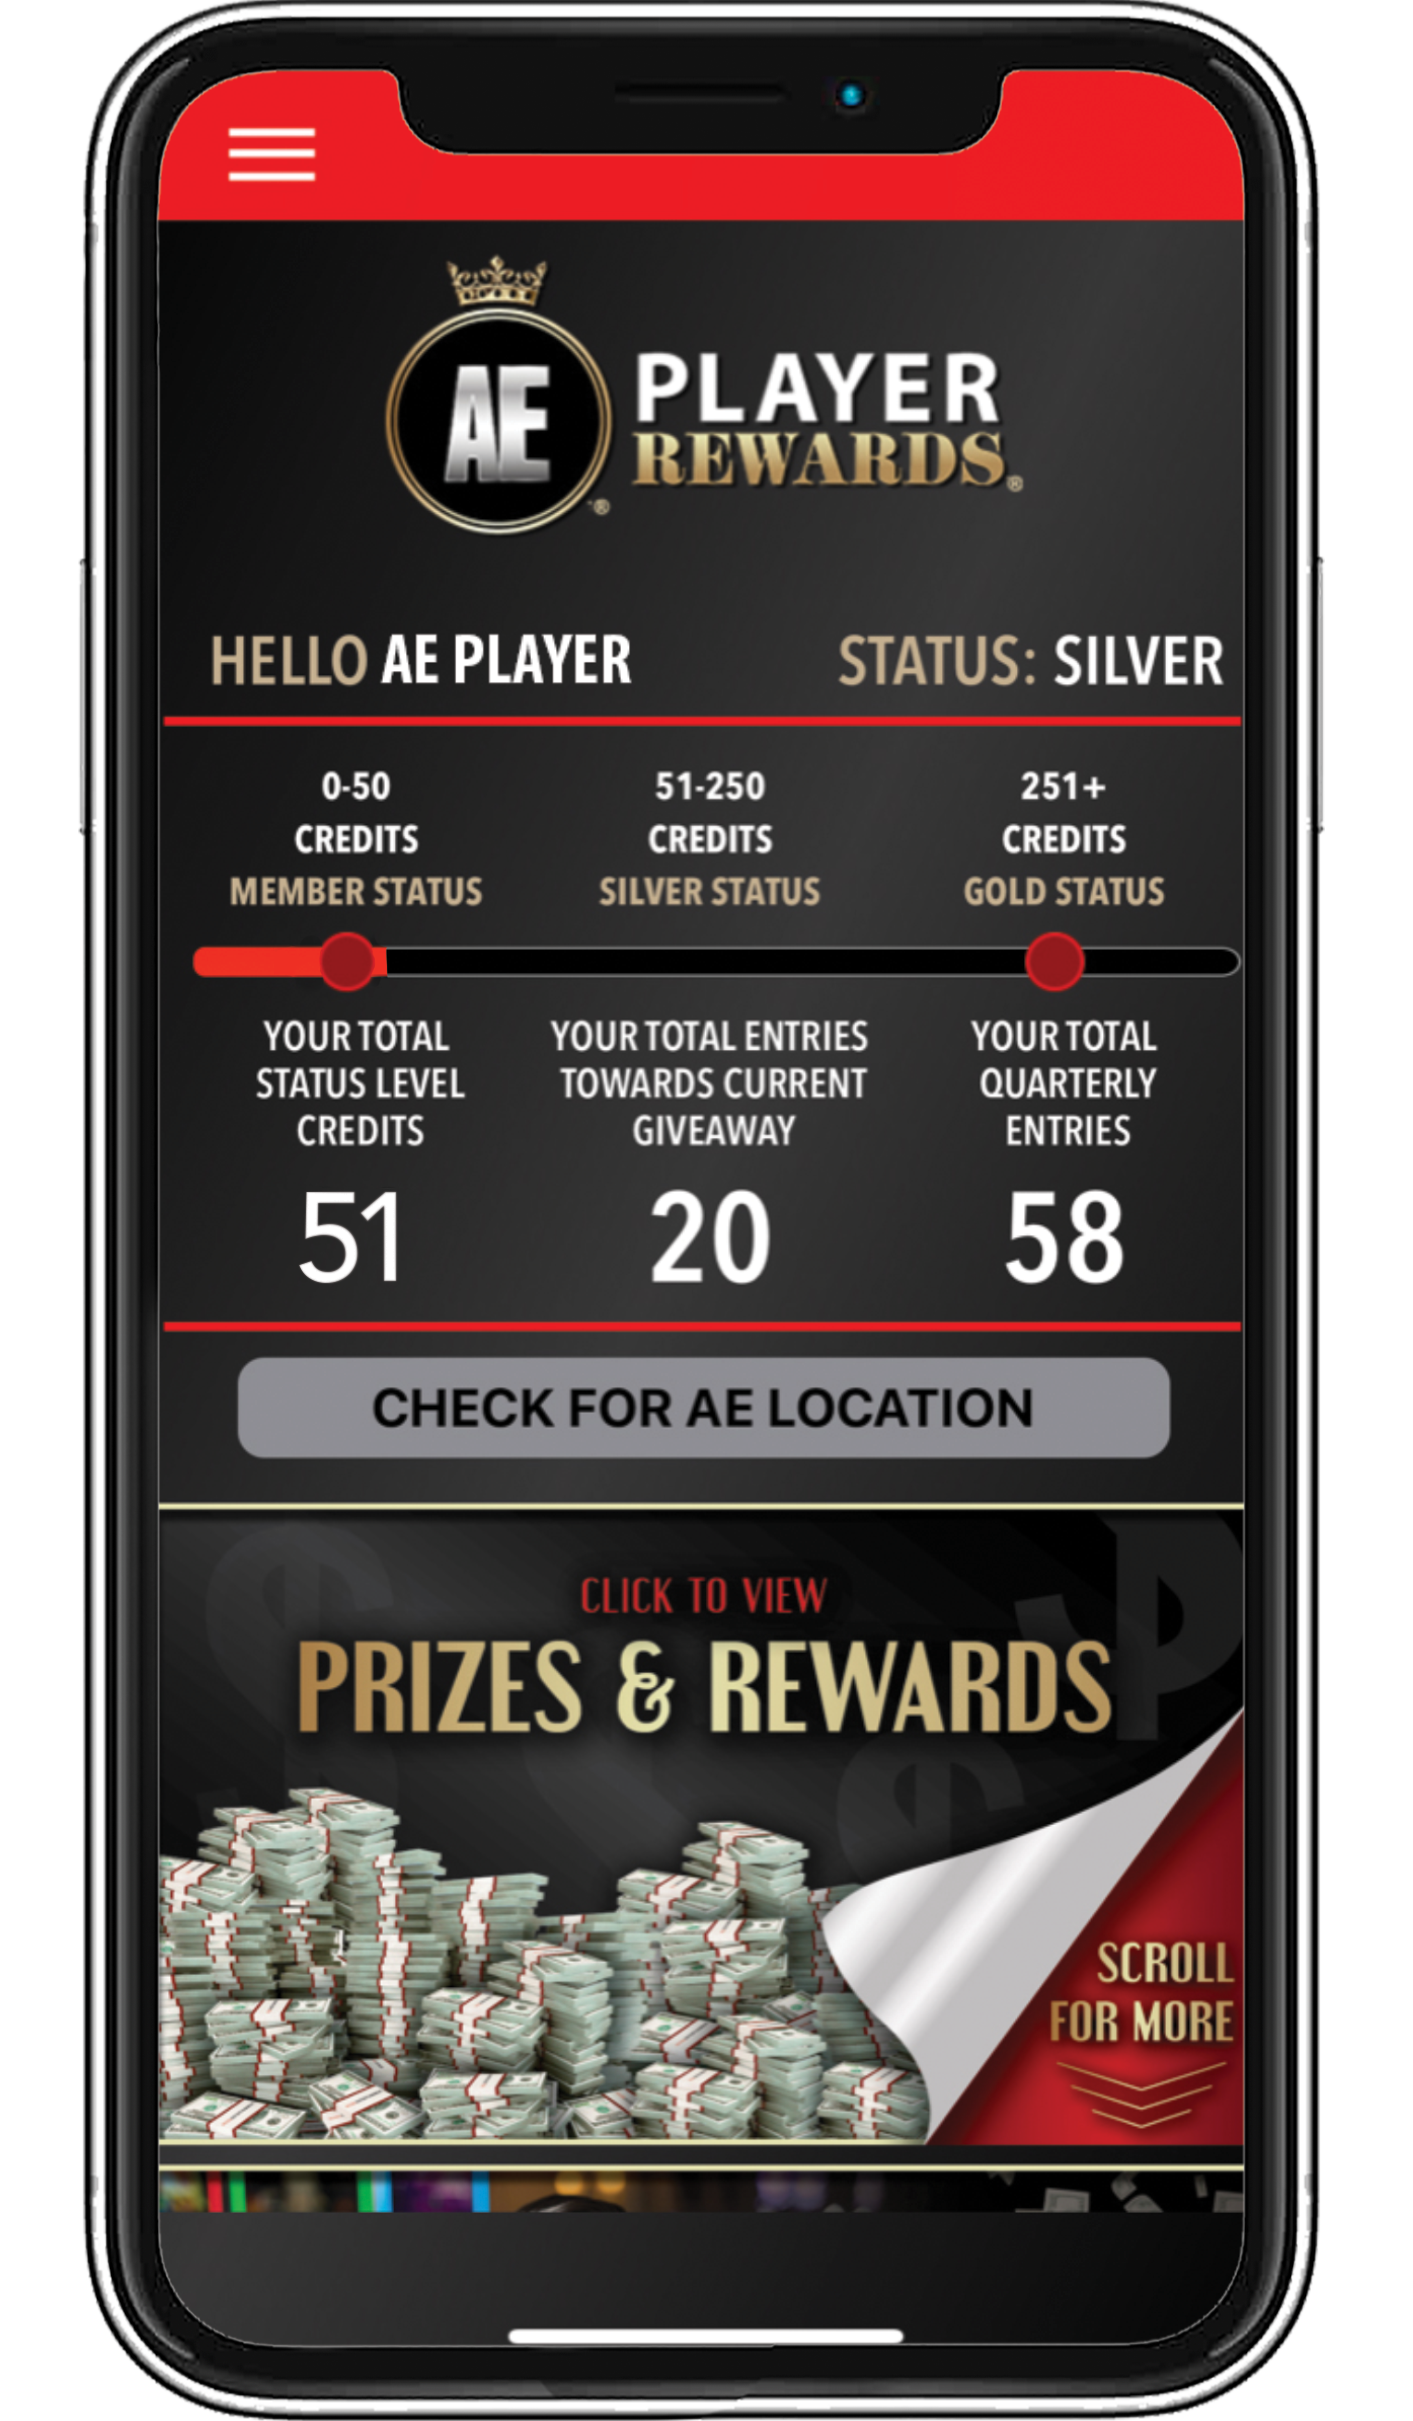 AEPlayer-Rewards-App-Home-Screen